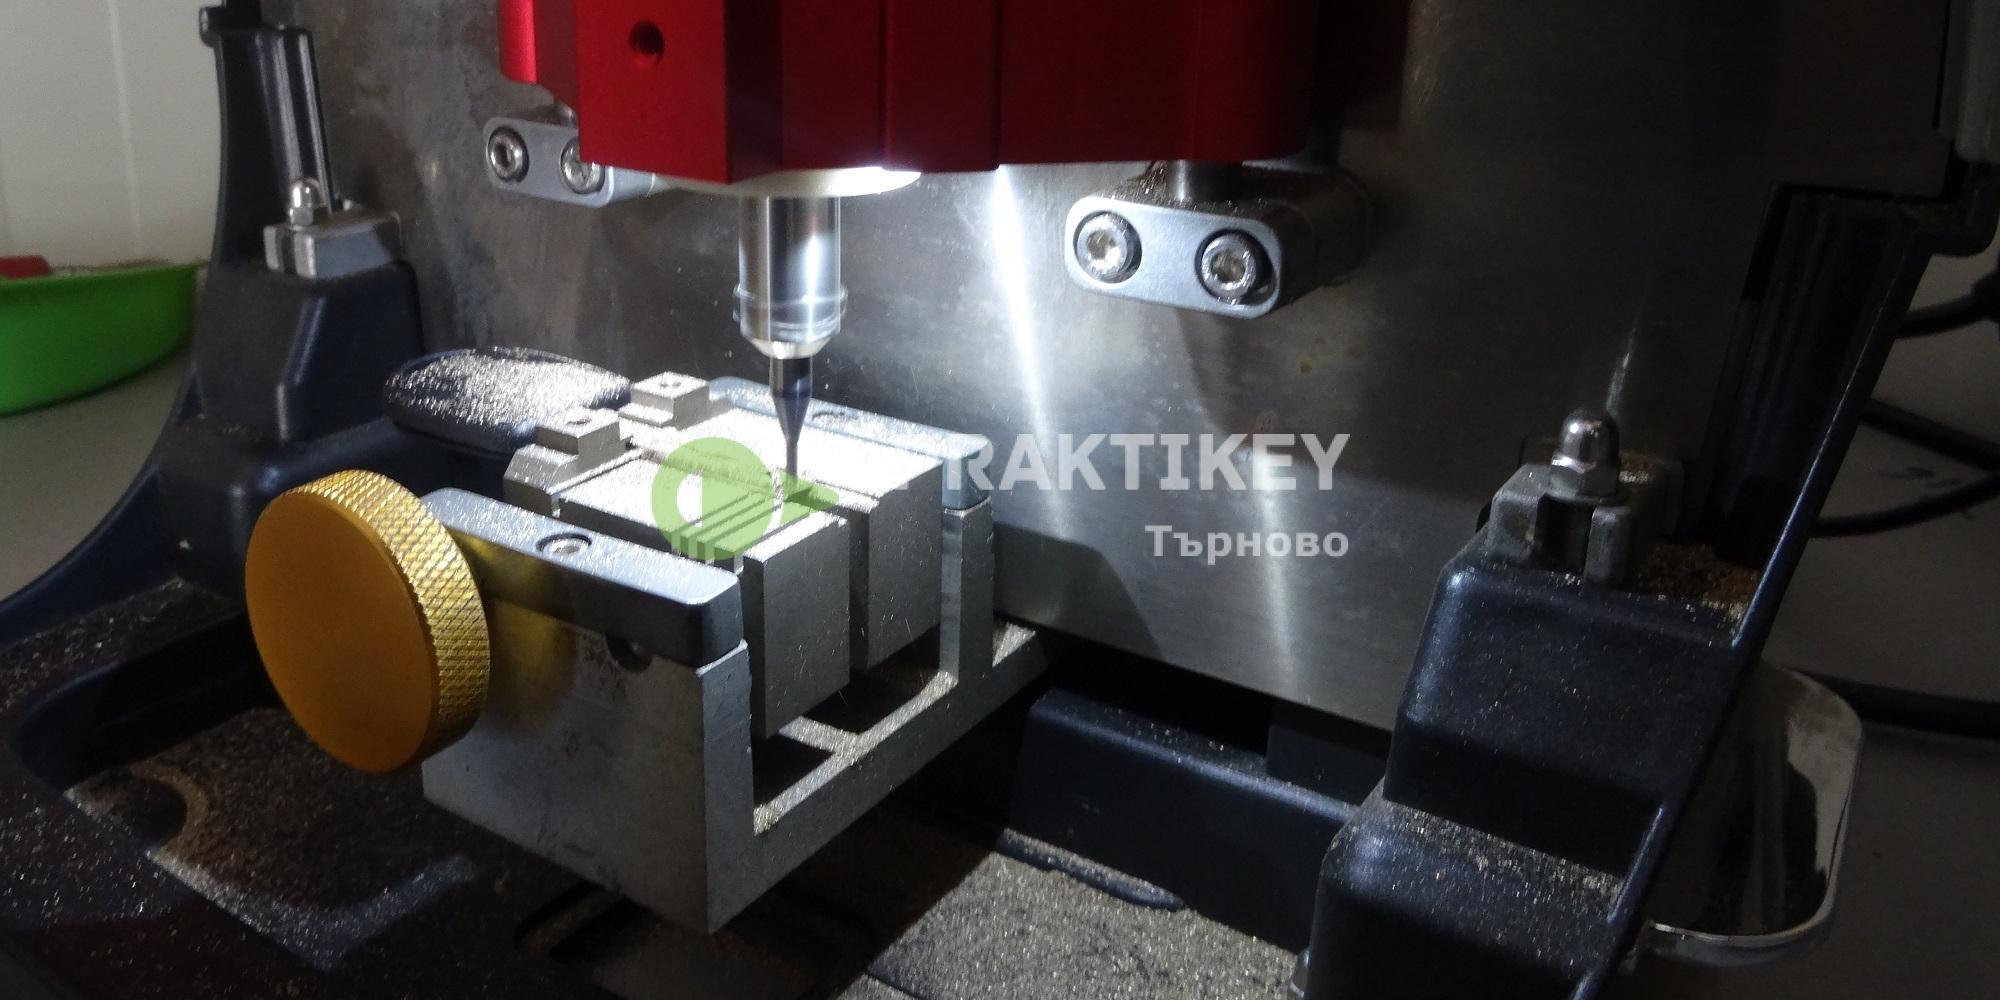 Изработка на Резервен Ключ - Praktikey Търново